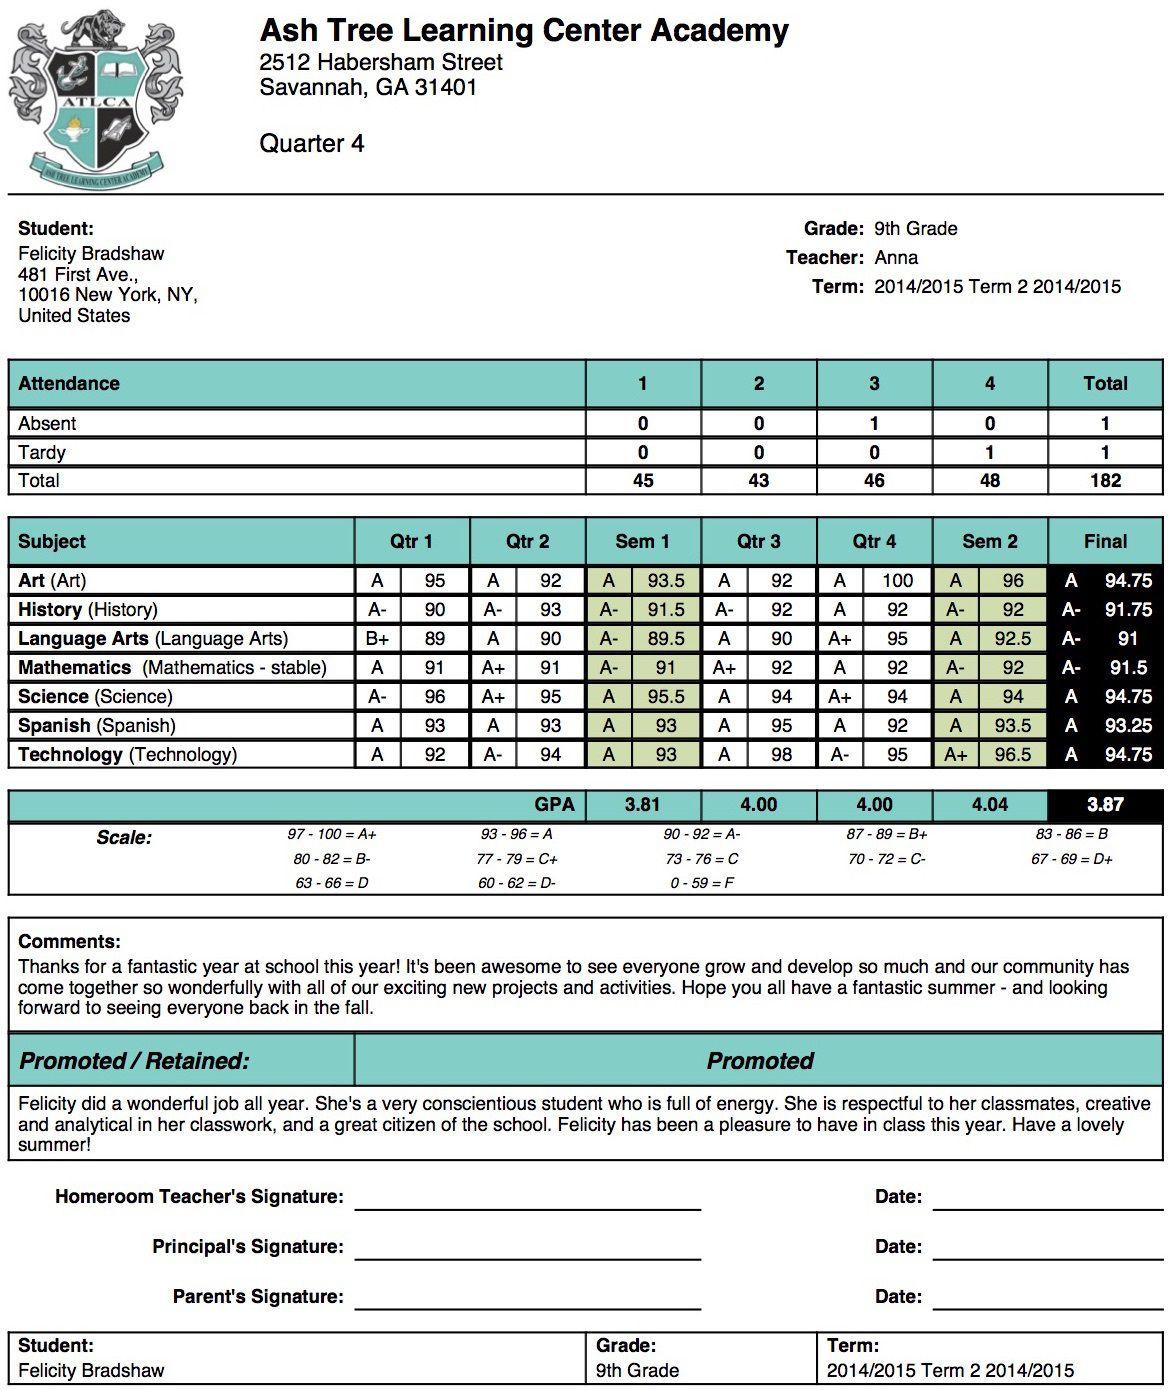 002 Marvelou Junior High School Report Card Template Design Full